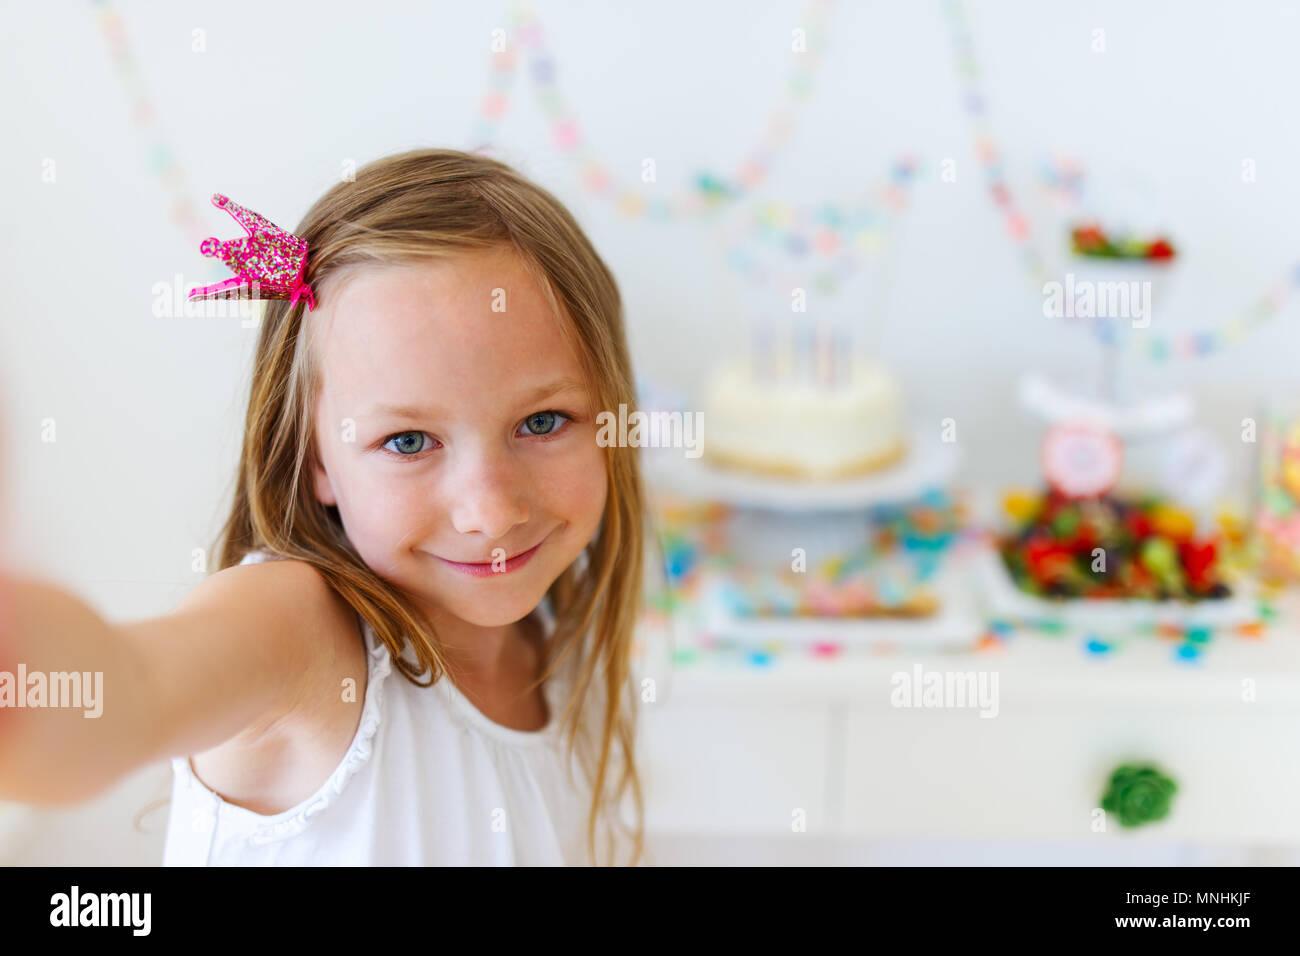 Adorable petite fille princesse avec couronne à kids Birthday party prendre selfies Photo Stock